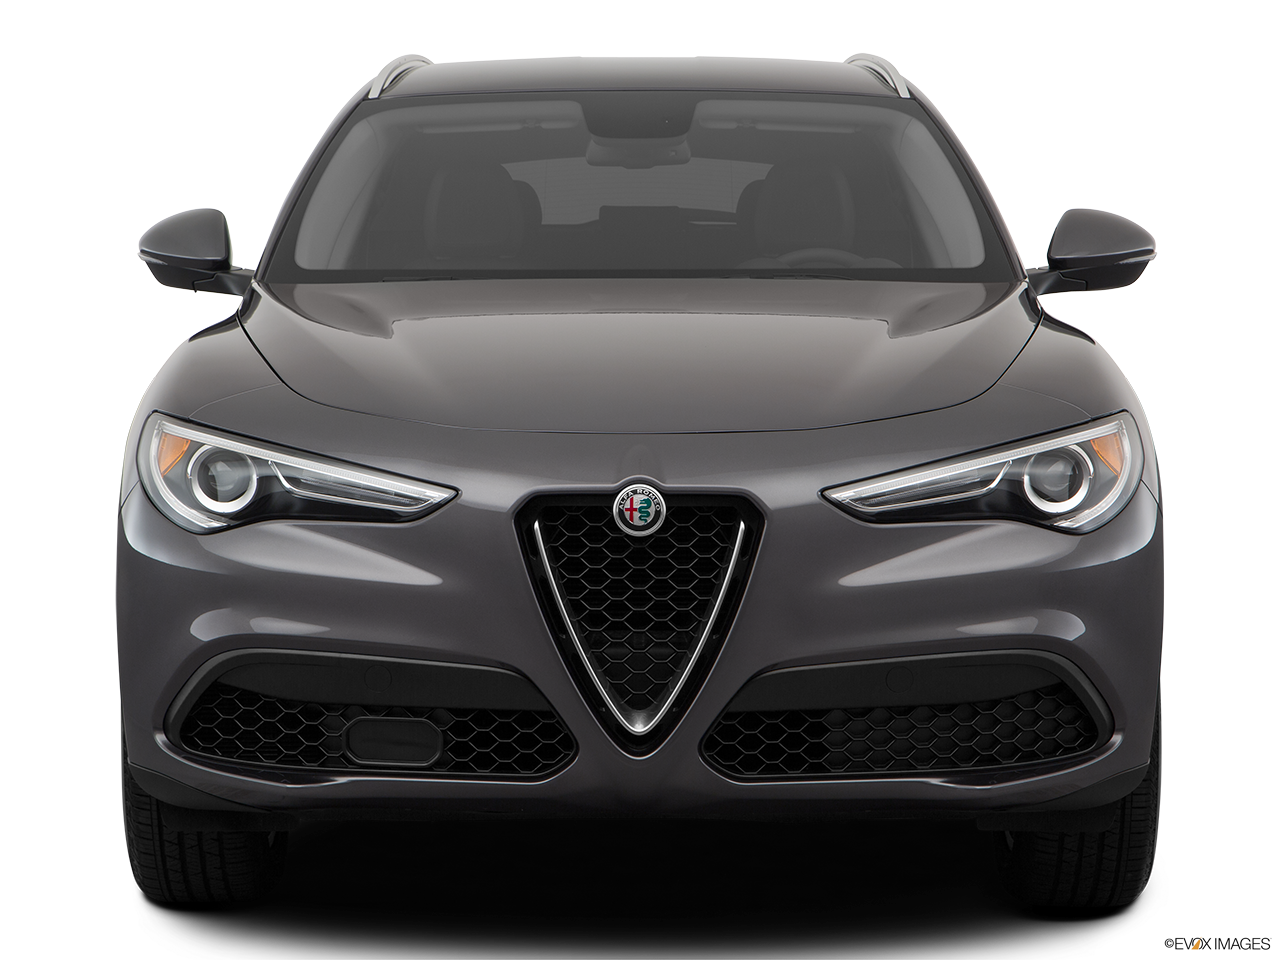 2019 Alfa Romeo Stelvio photo